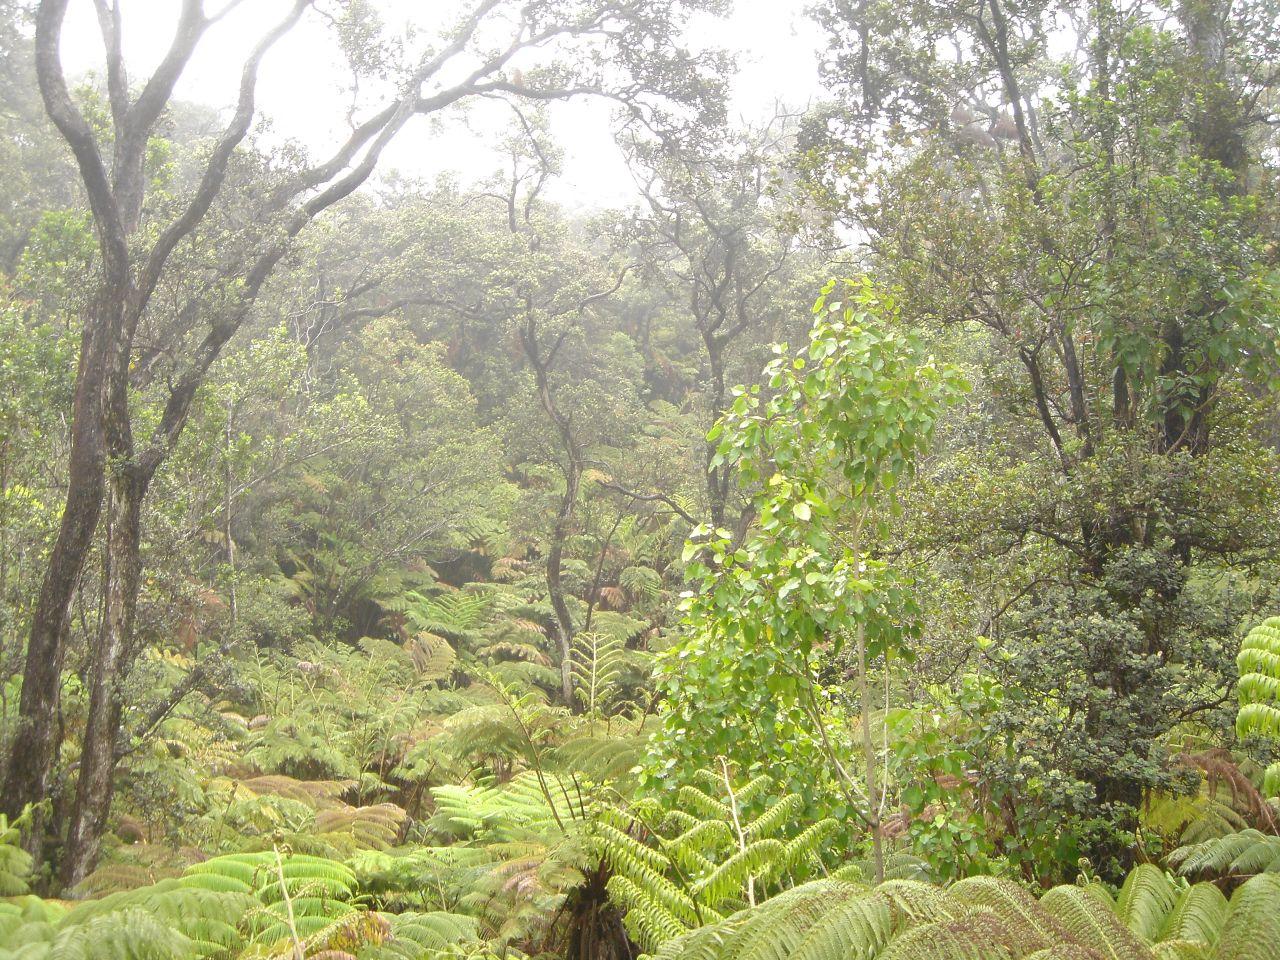 Rainforest in Hawaii